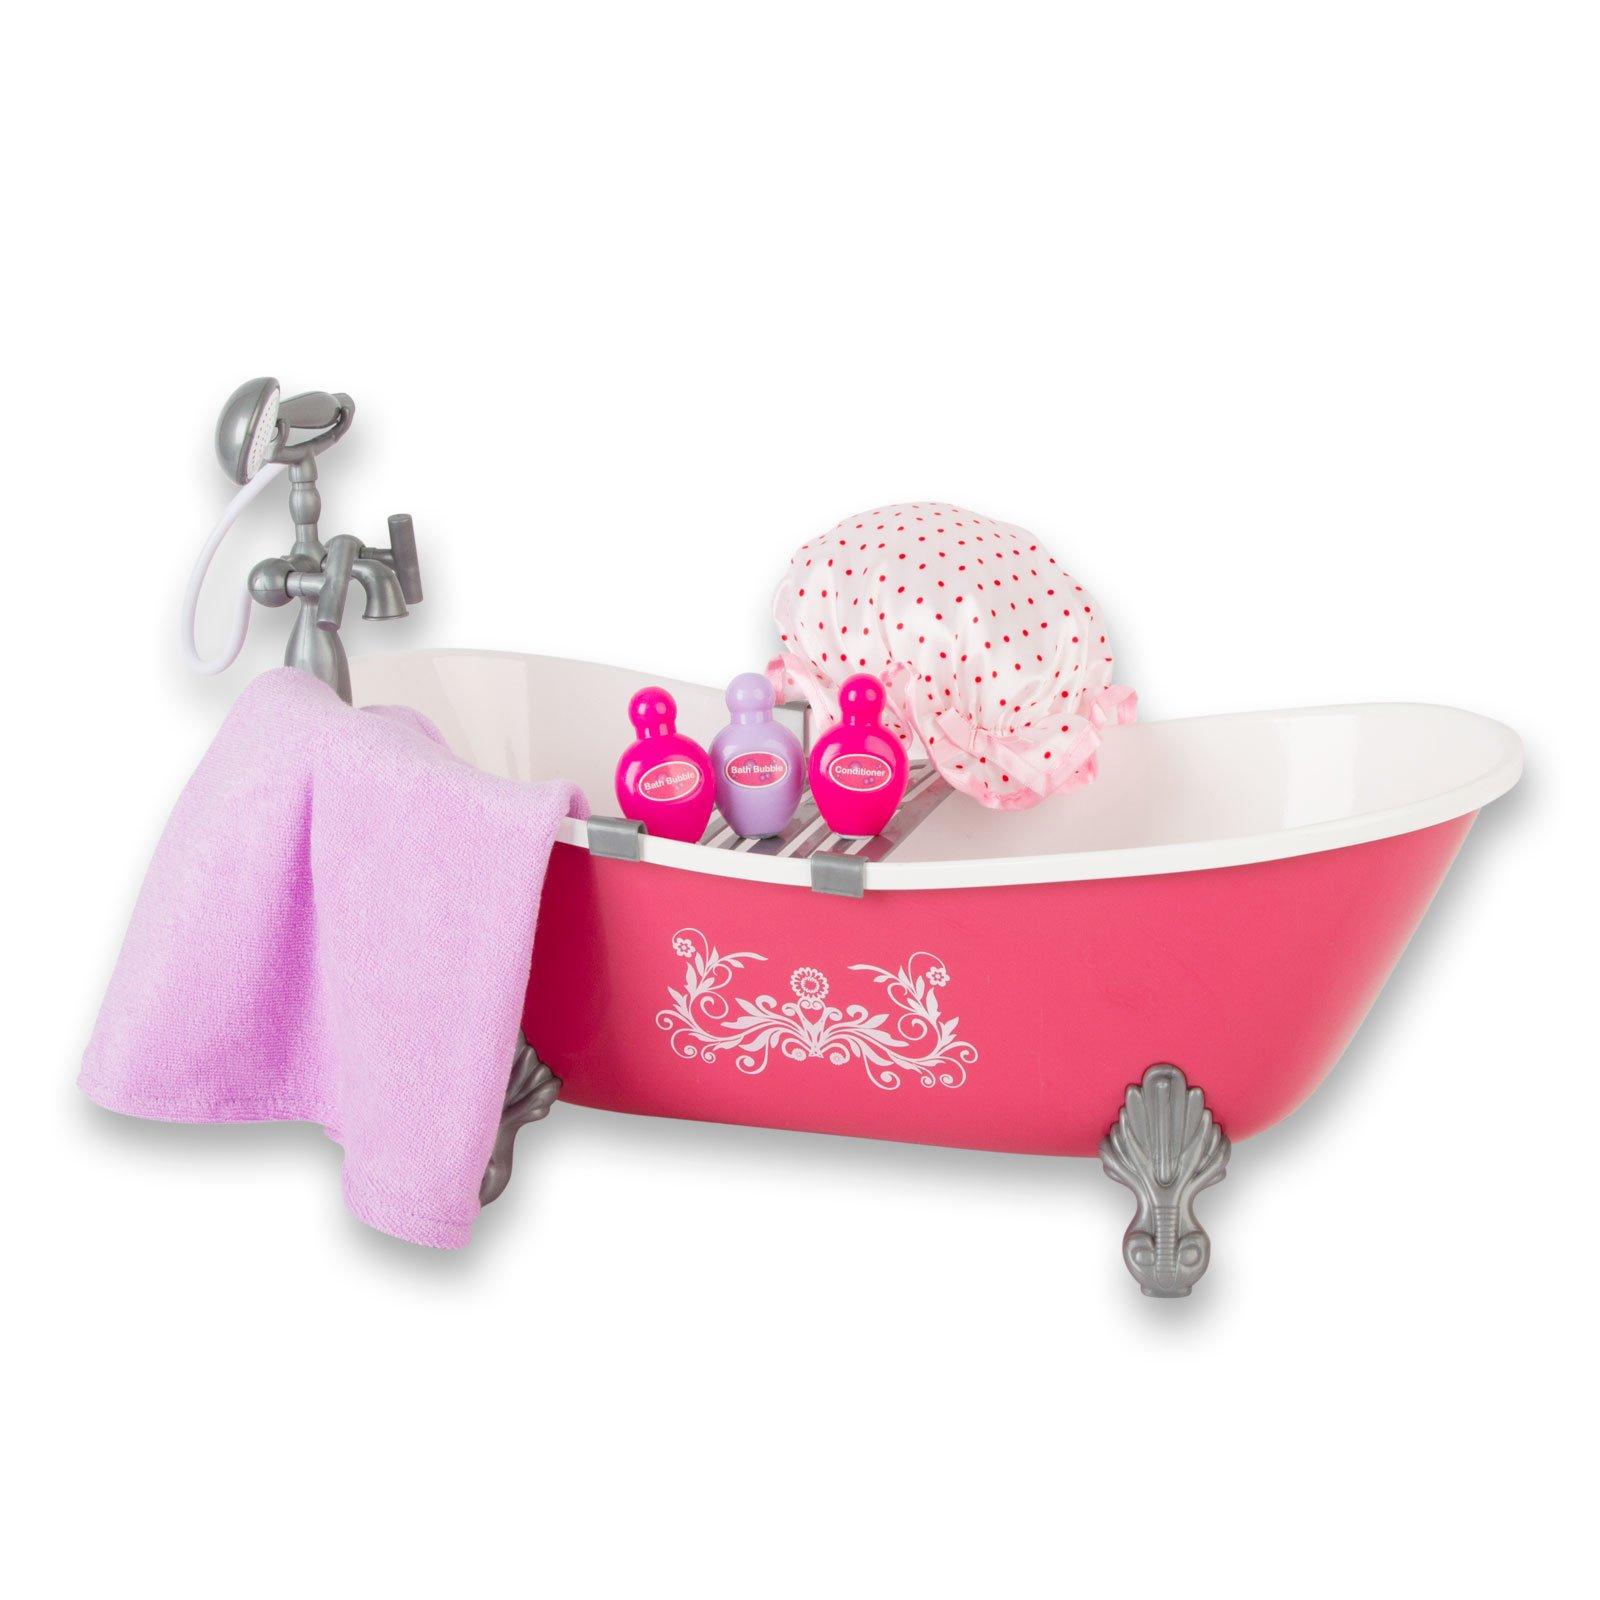 Beverly Hills 18'' Doll Bath Set, Includes Bath Tub and 4 Accessories